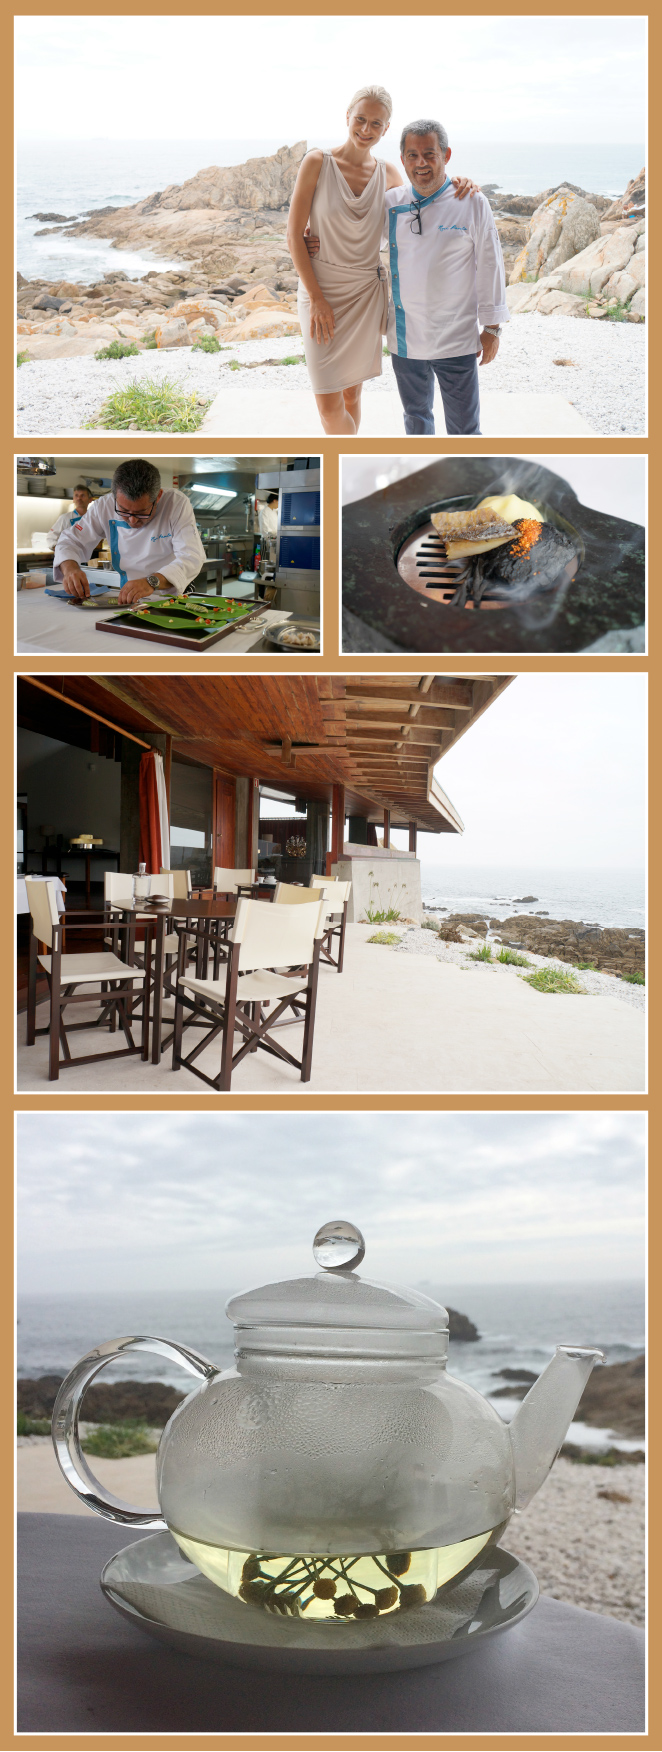 Restaurante Boa Nova del famoso chef portugués Rui Paula